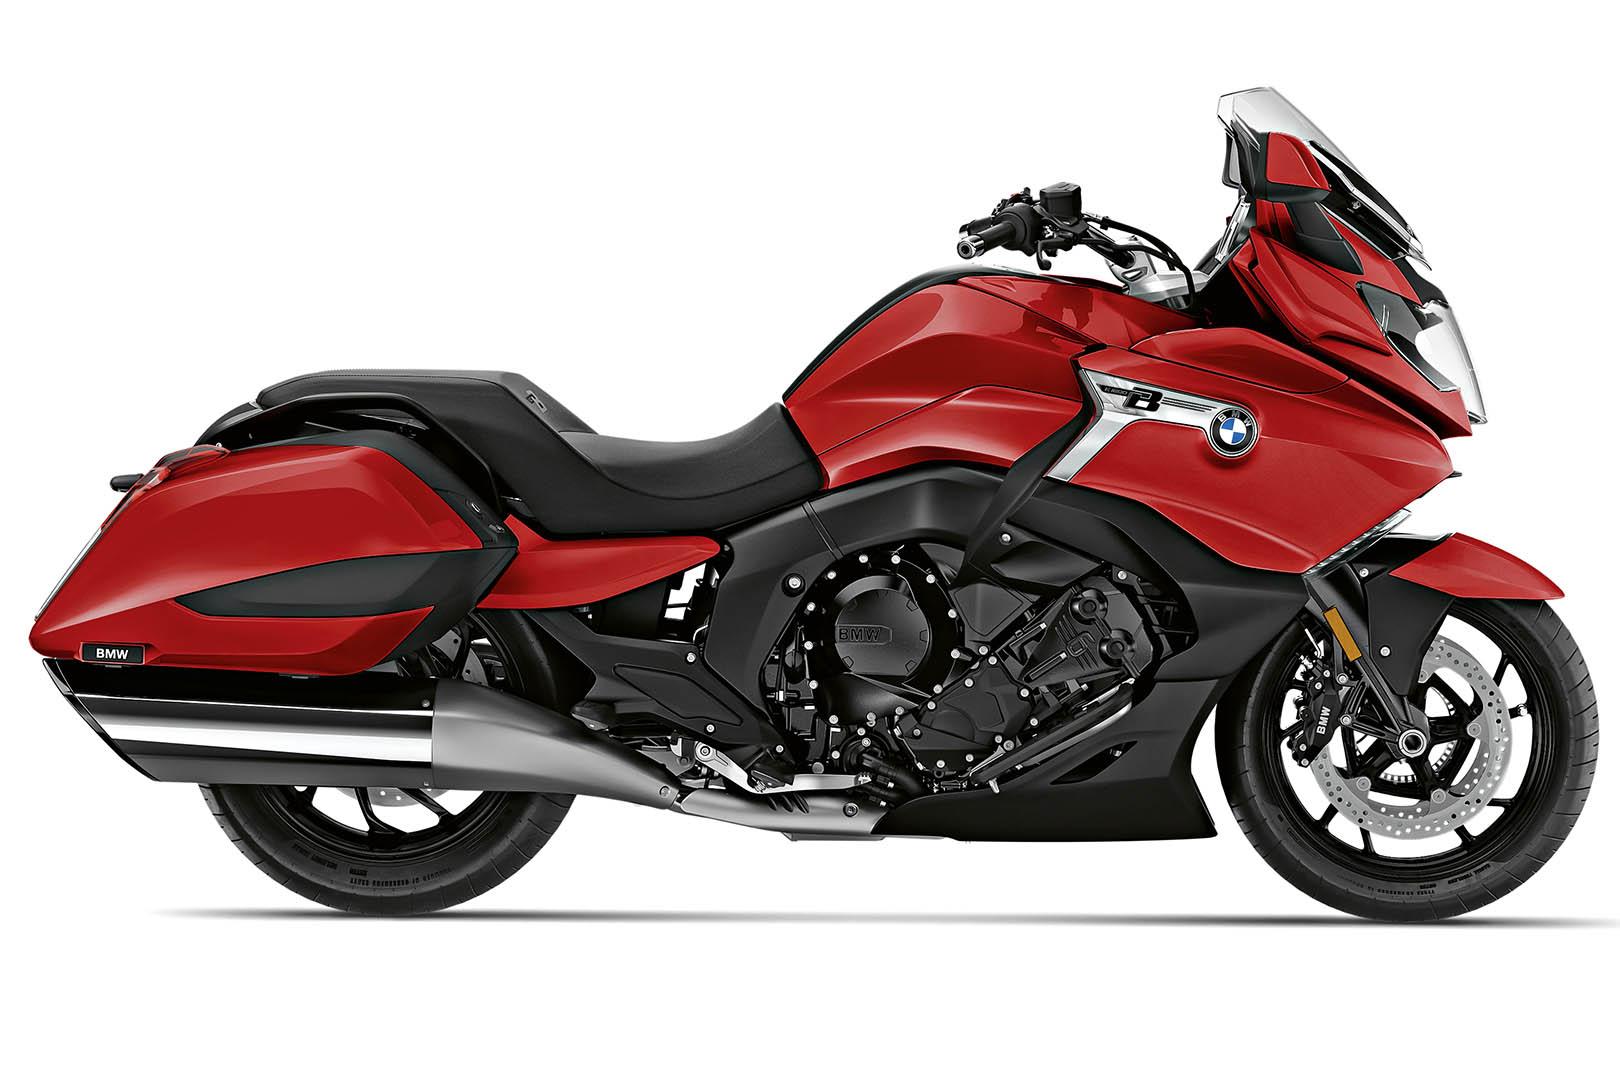 2021-BMW-K-1600-B-First-Look-bagger-touring-motorcycle-3.jpg